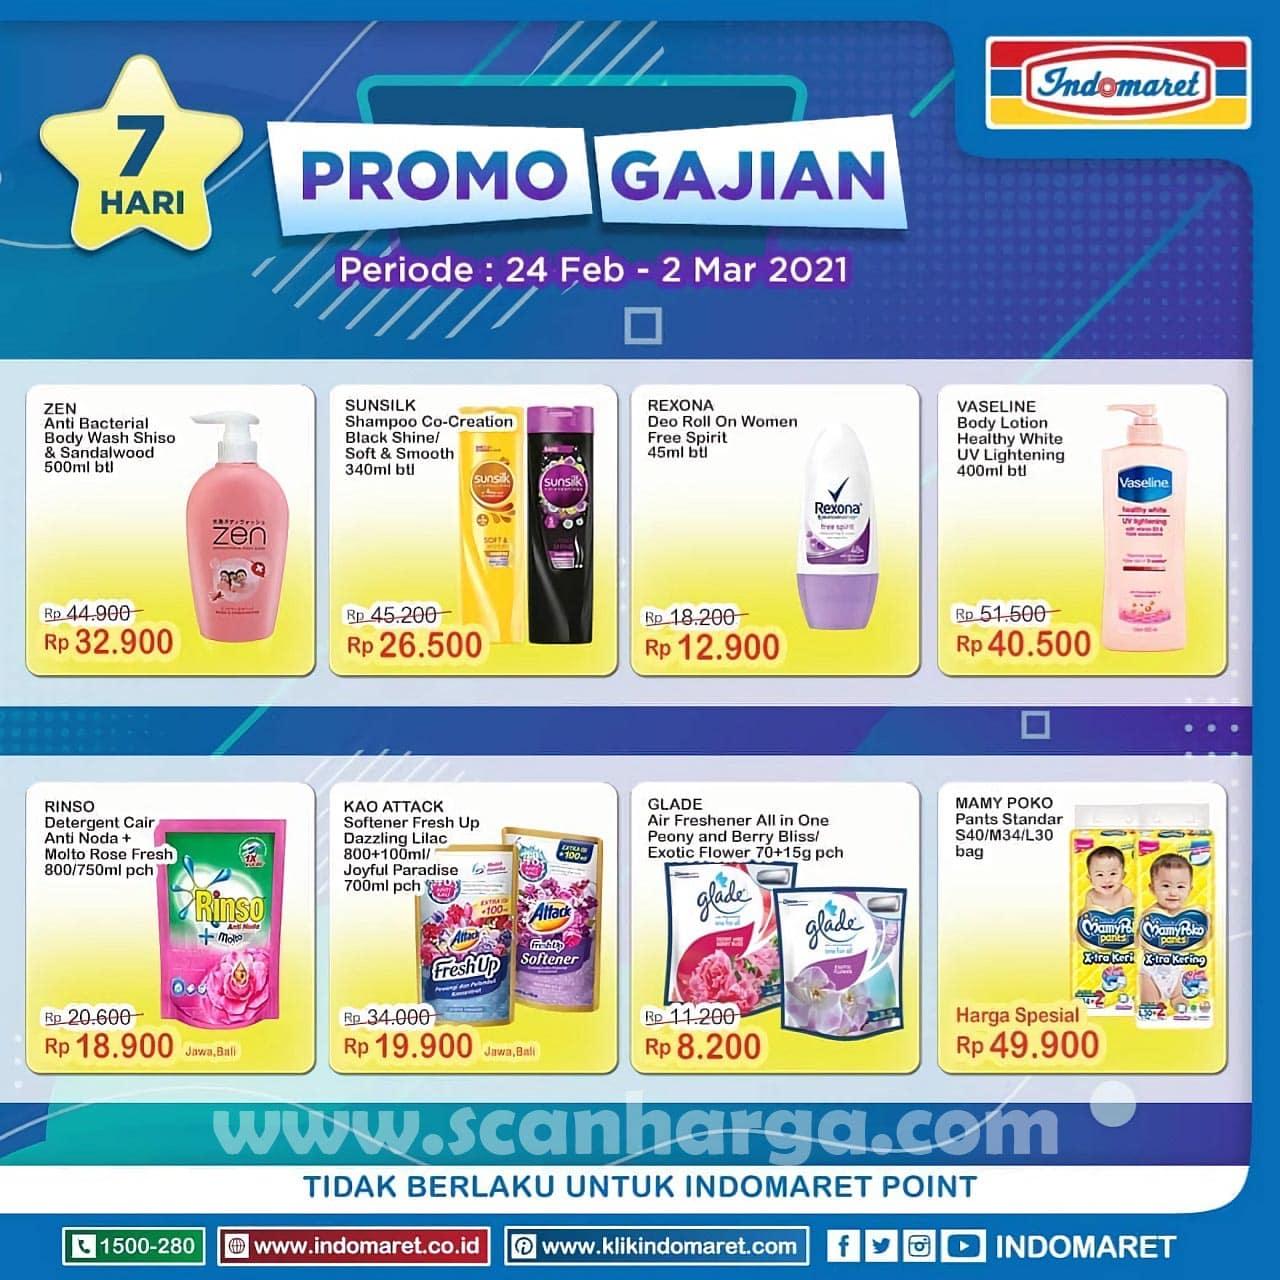 INDOMARET Promo GAJIAN Periode 24 Februari - 2 Maret 2021 2